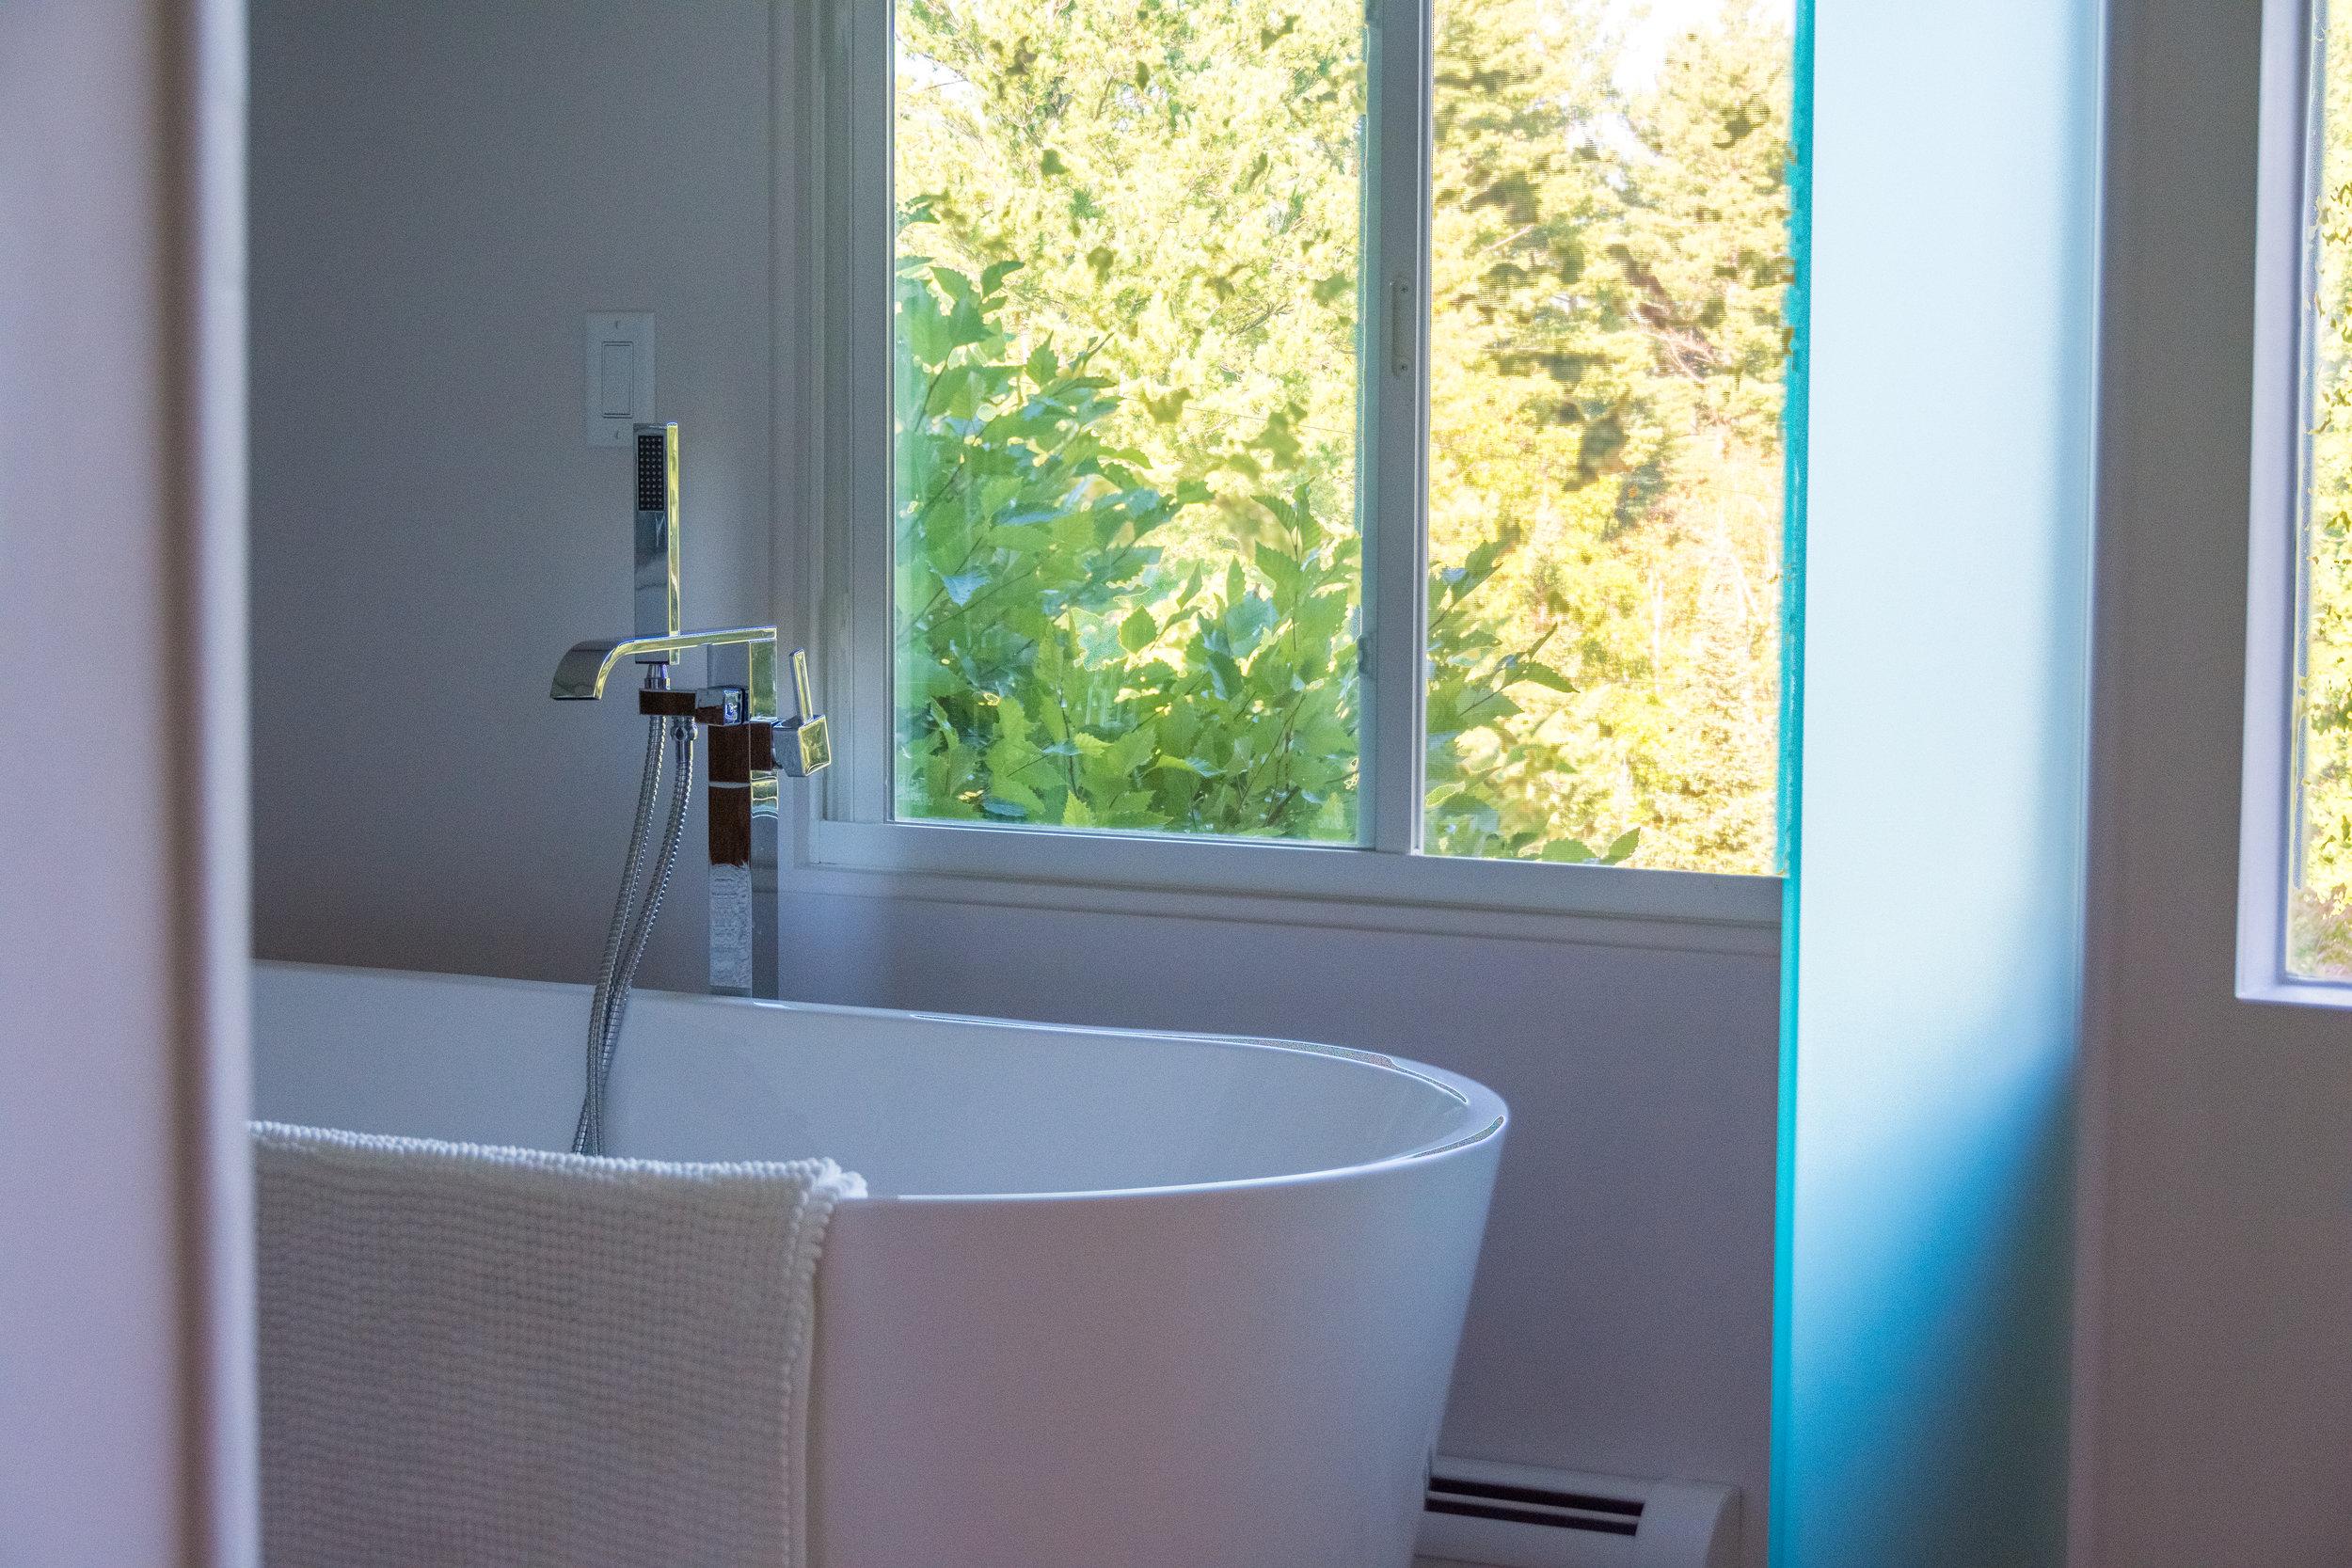 41 Cluett Dr_Master Bathroom--2.jpg